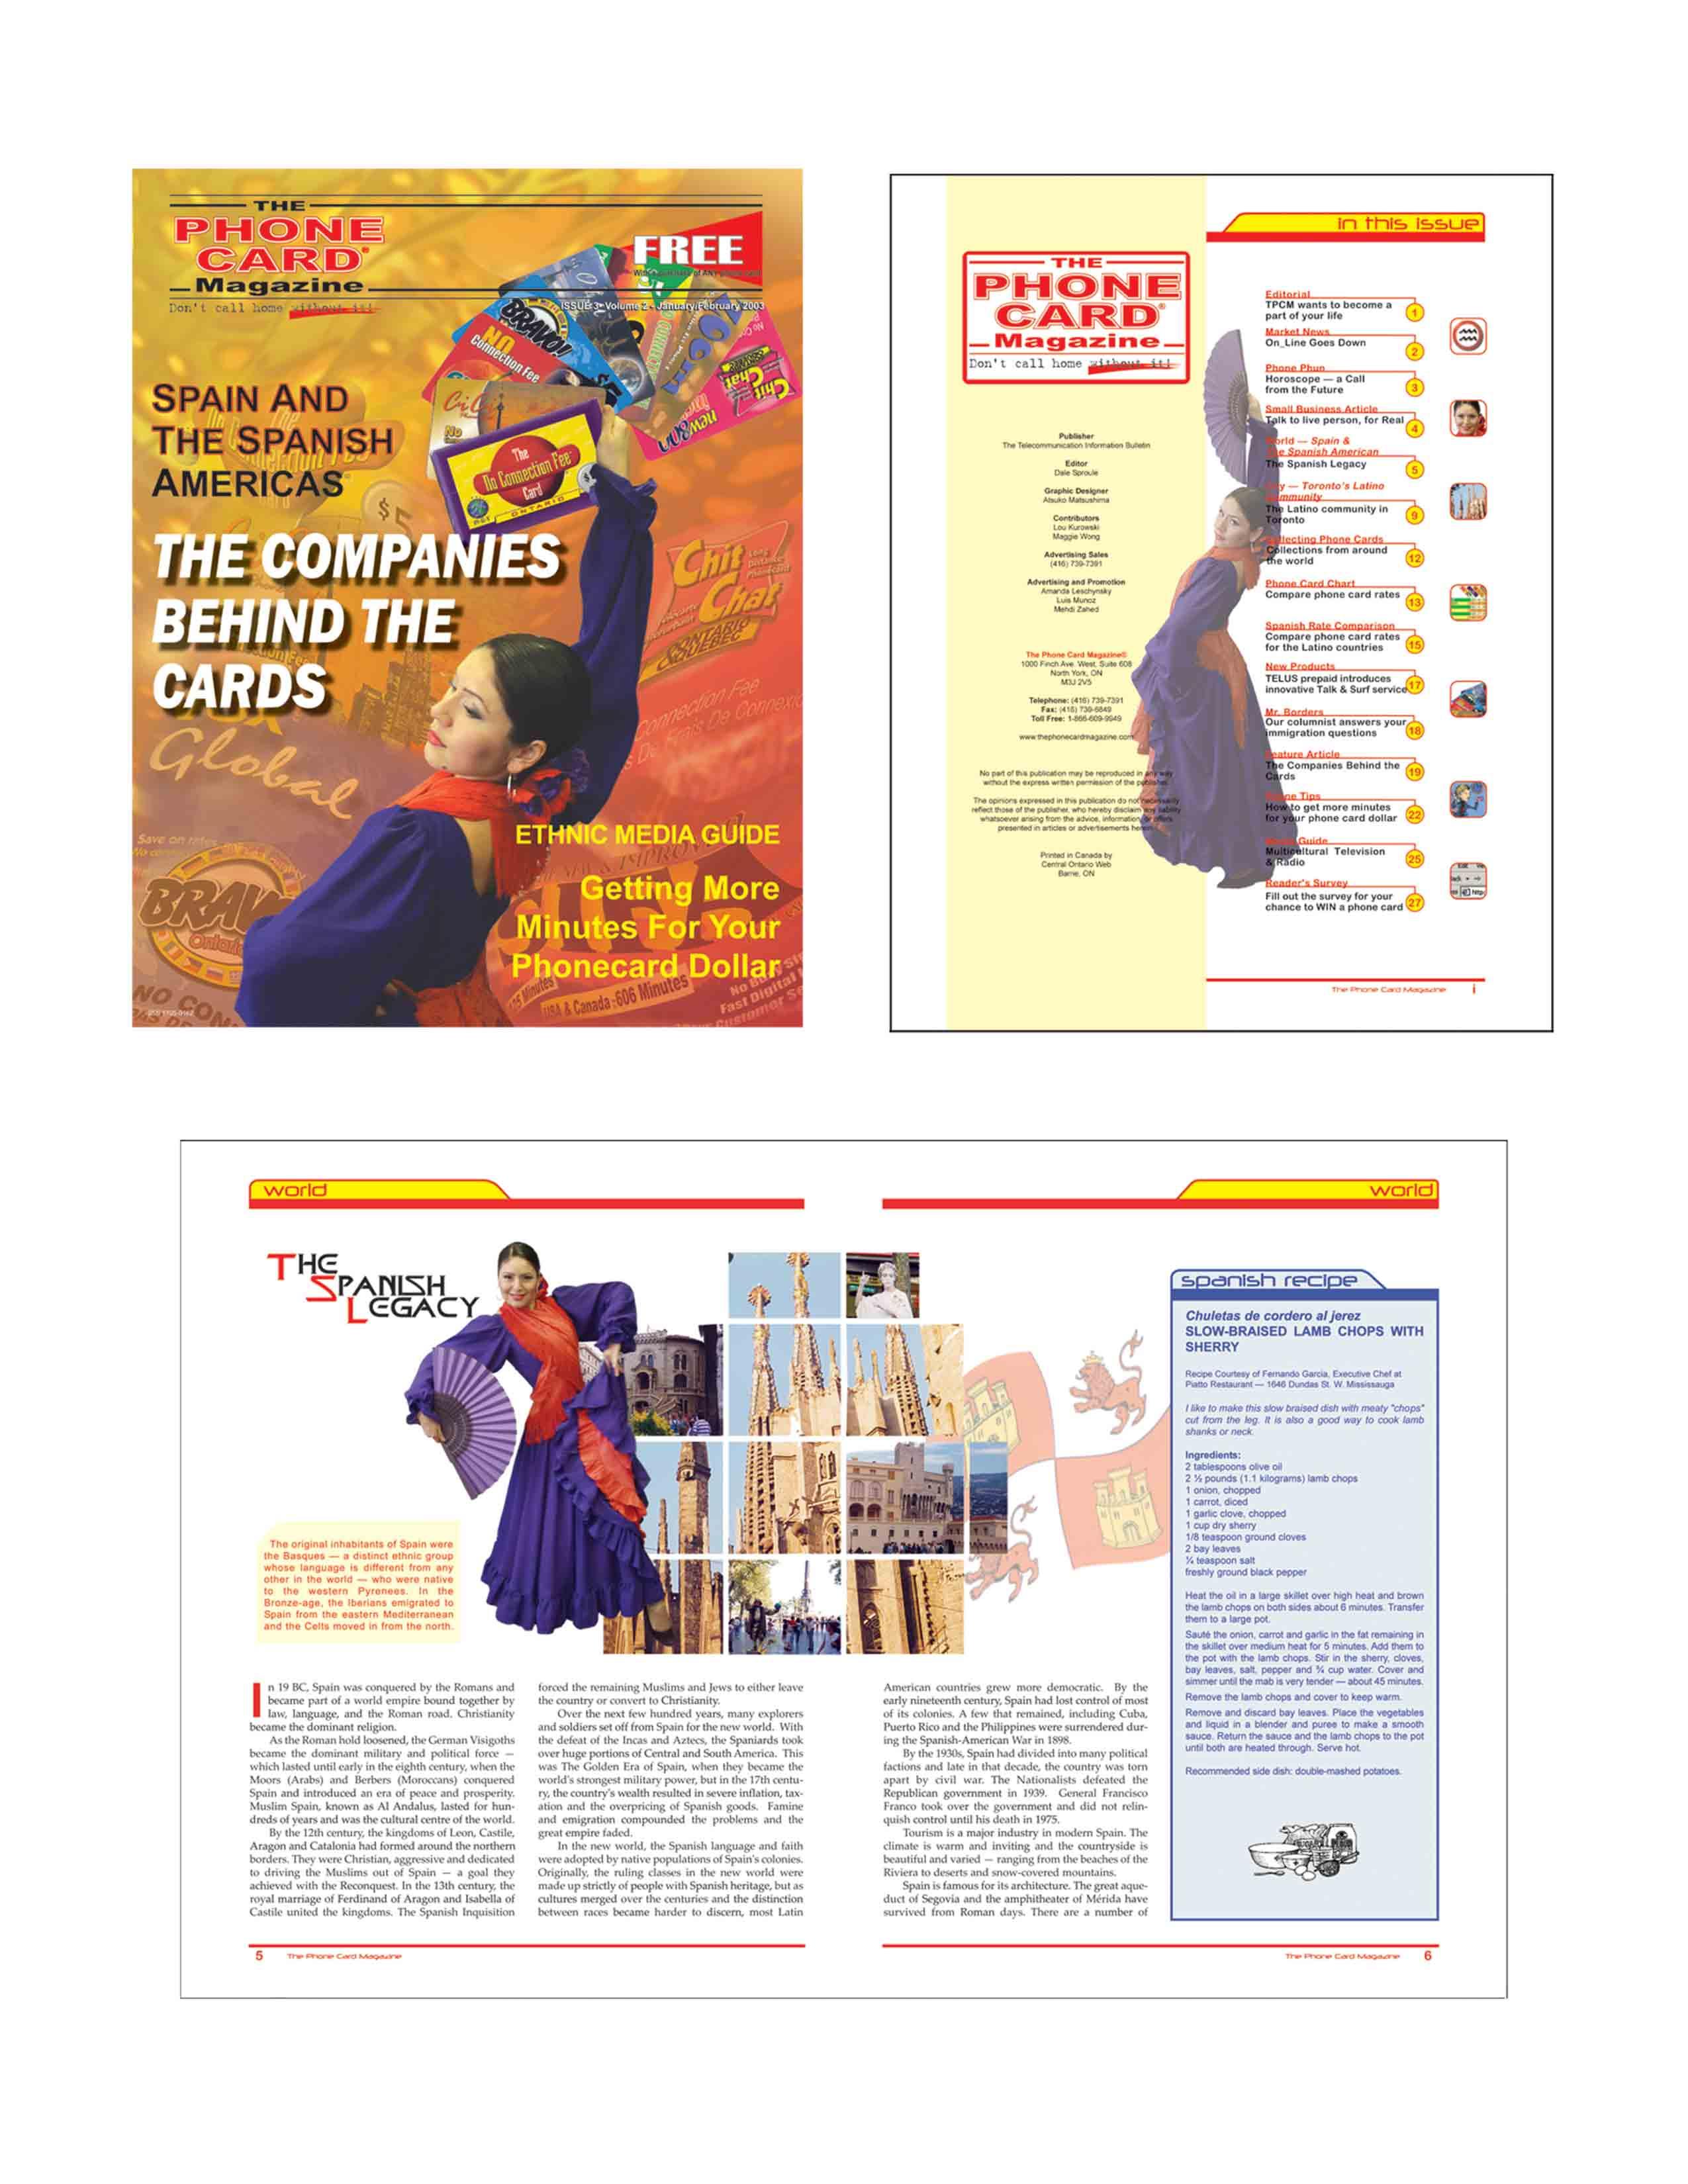 The Phone Card Magazine layout